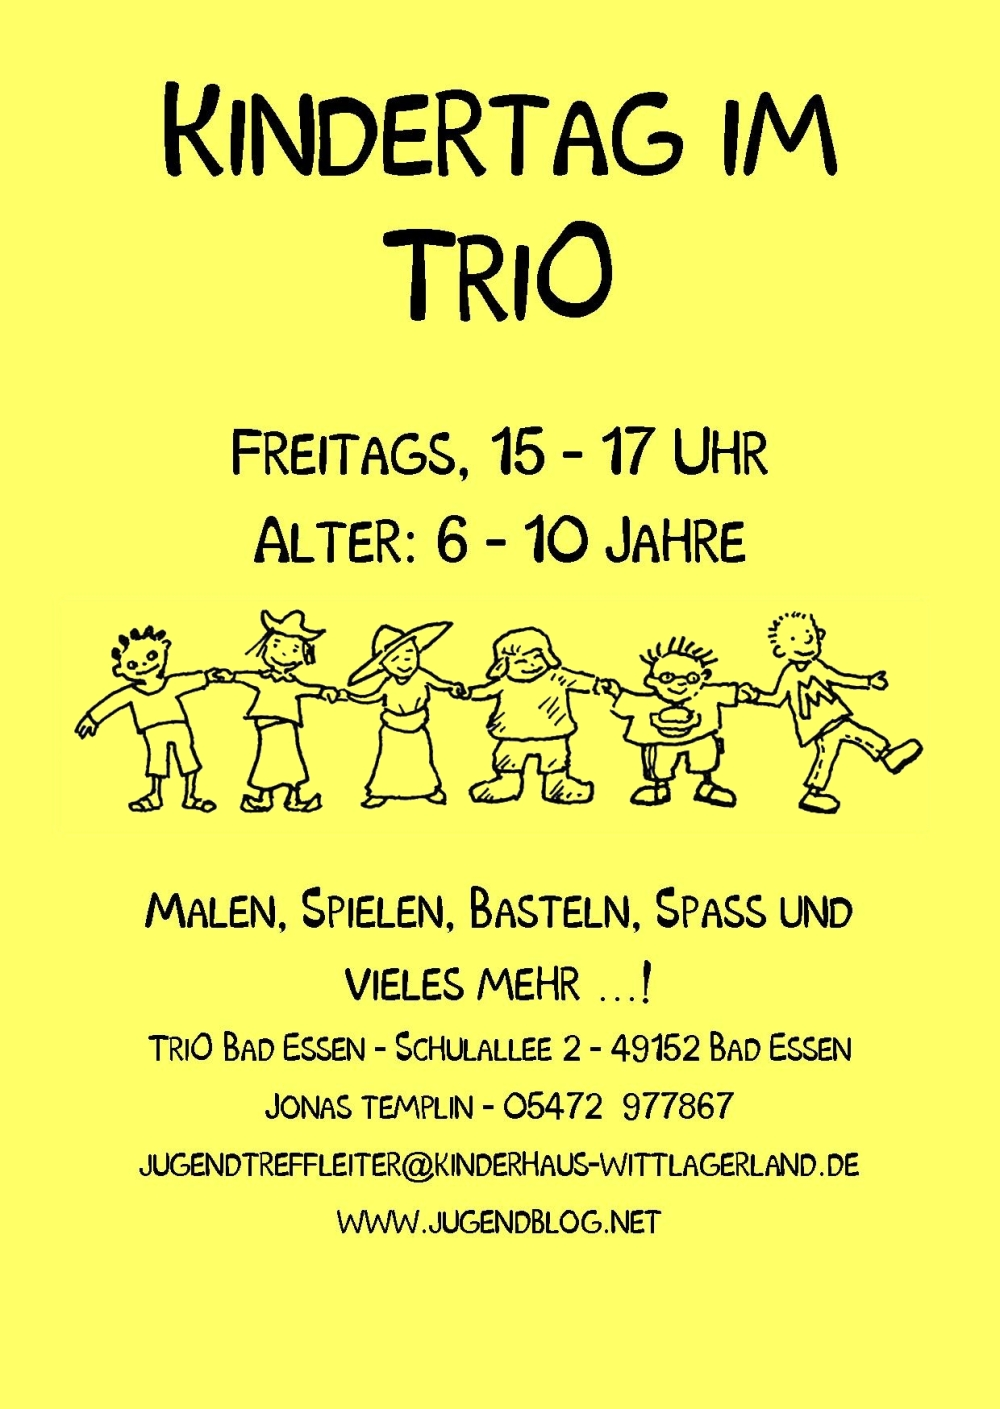 Kindertag TriO Front Publisher 08.2016 gelb